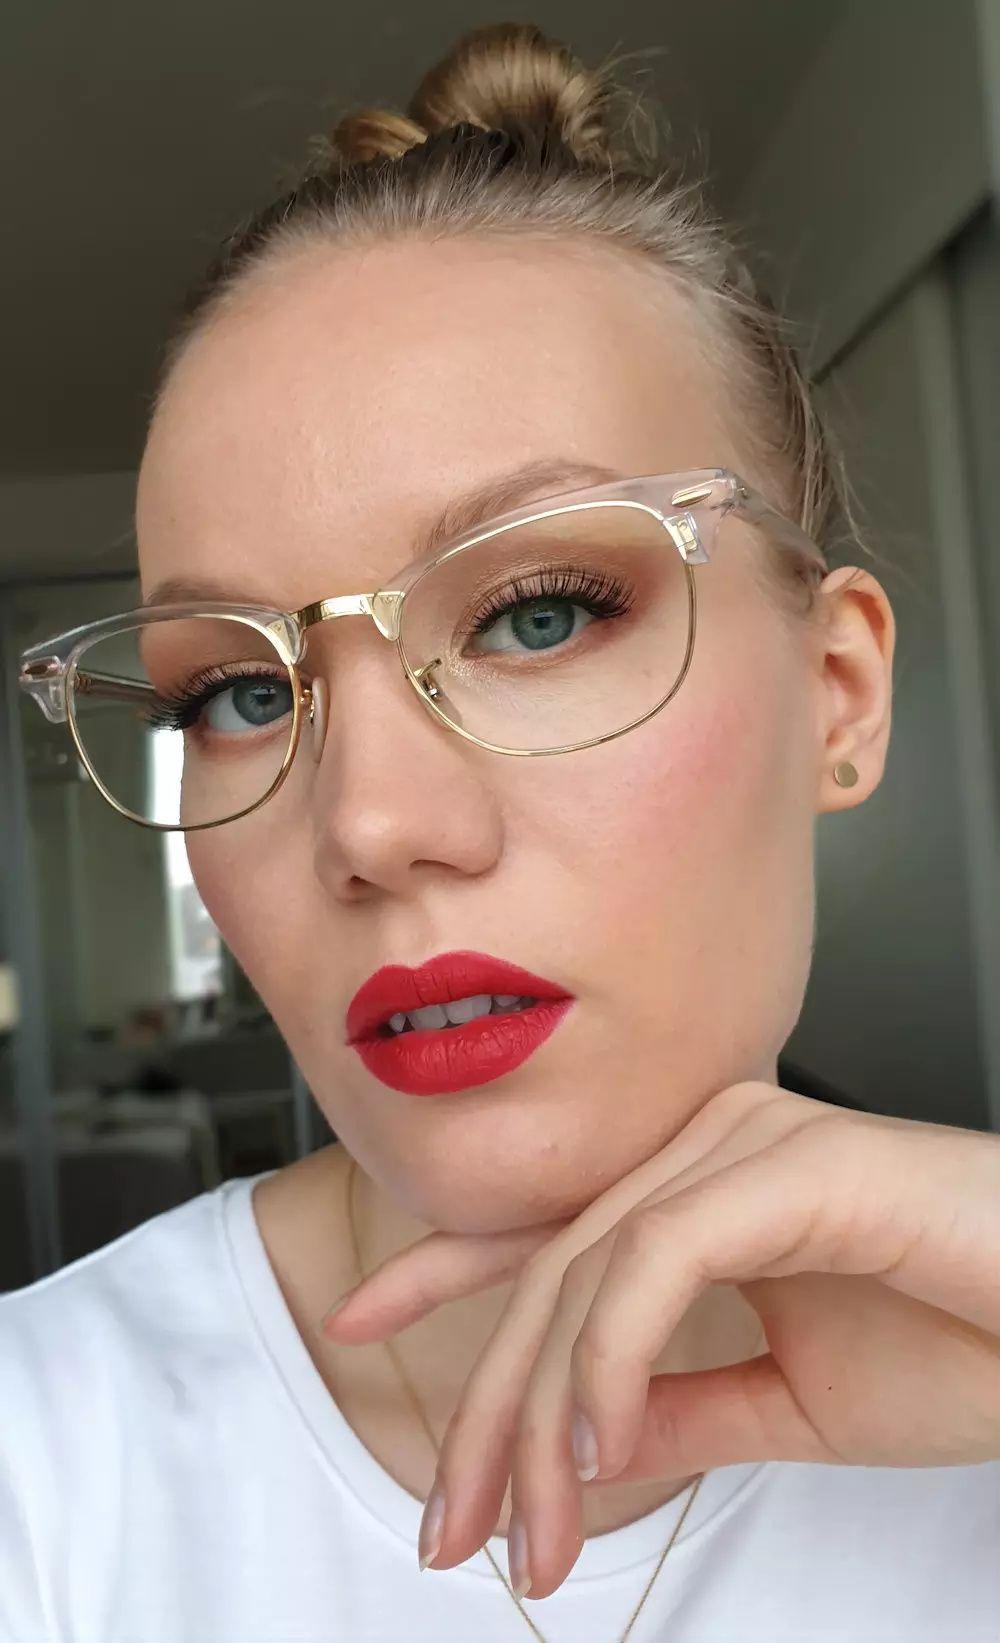 Classic Makeup For Glasses Wearers Charlotta Eve In 2020 Classic Makeup Glasses Makeup Glasses